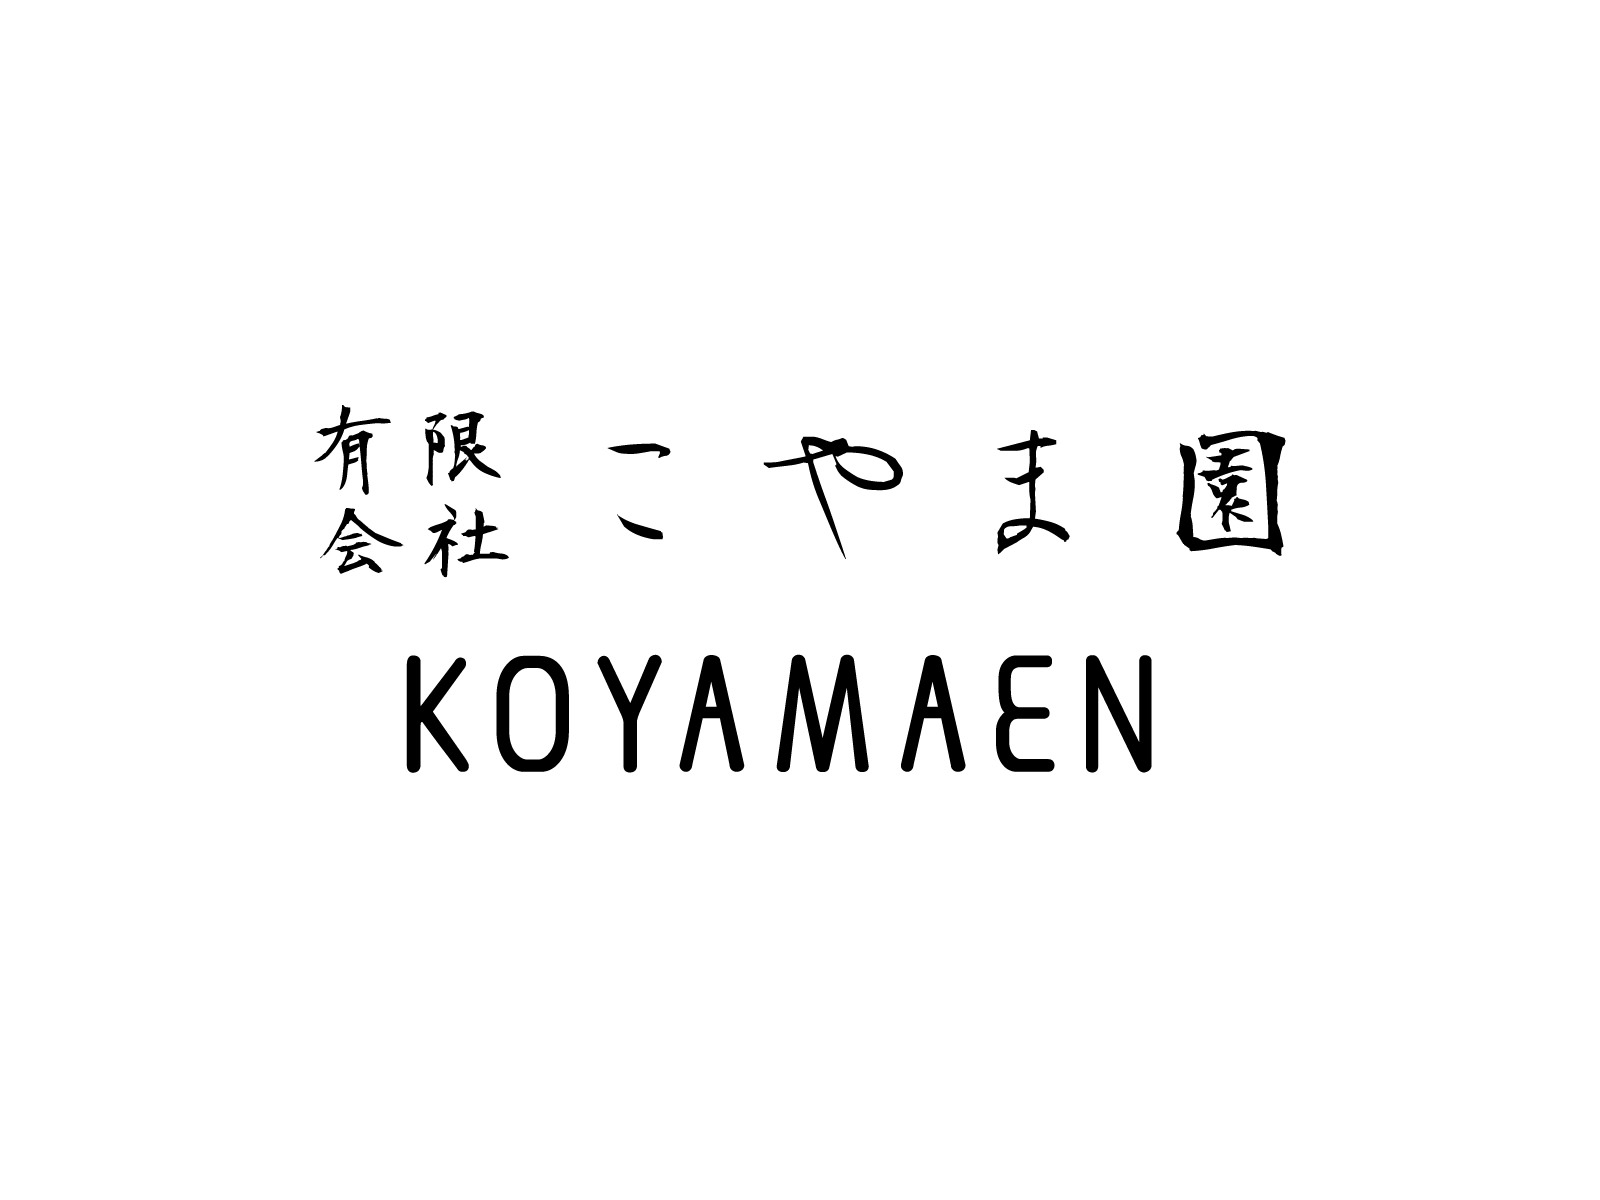 works_koyamaen_logo_02